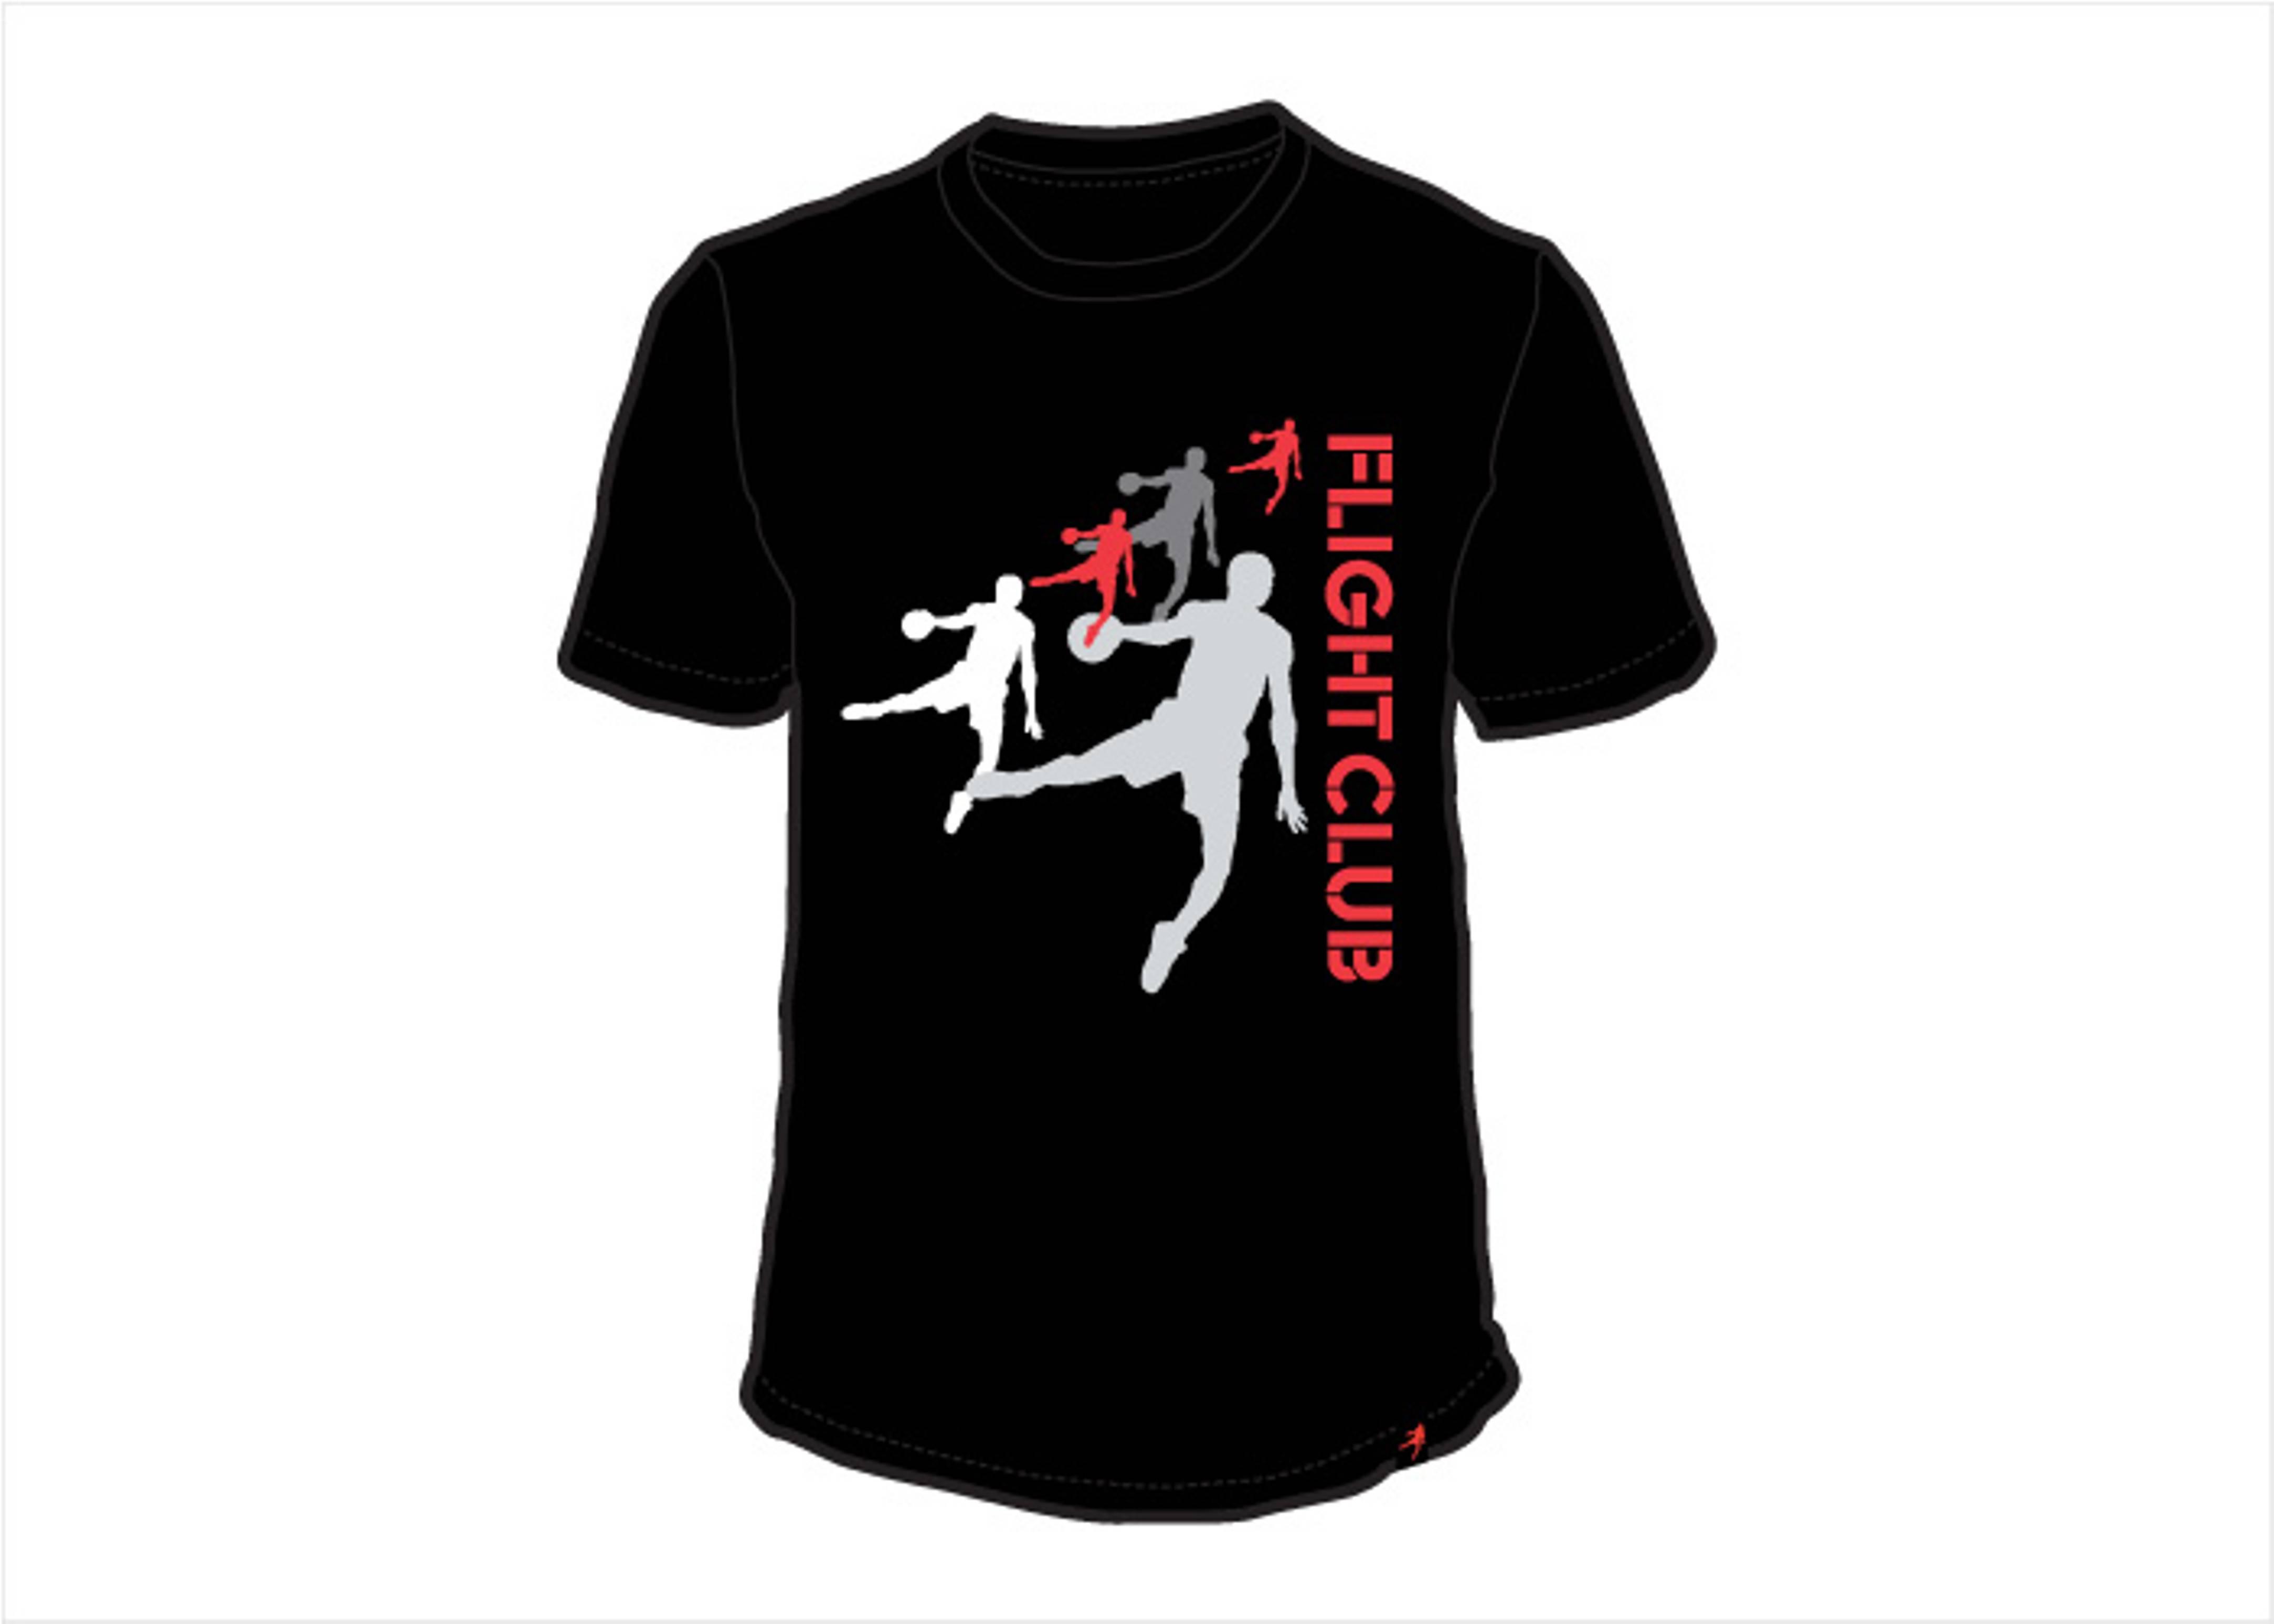 hangtime club t-shirt